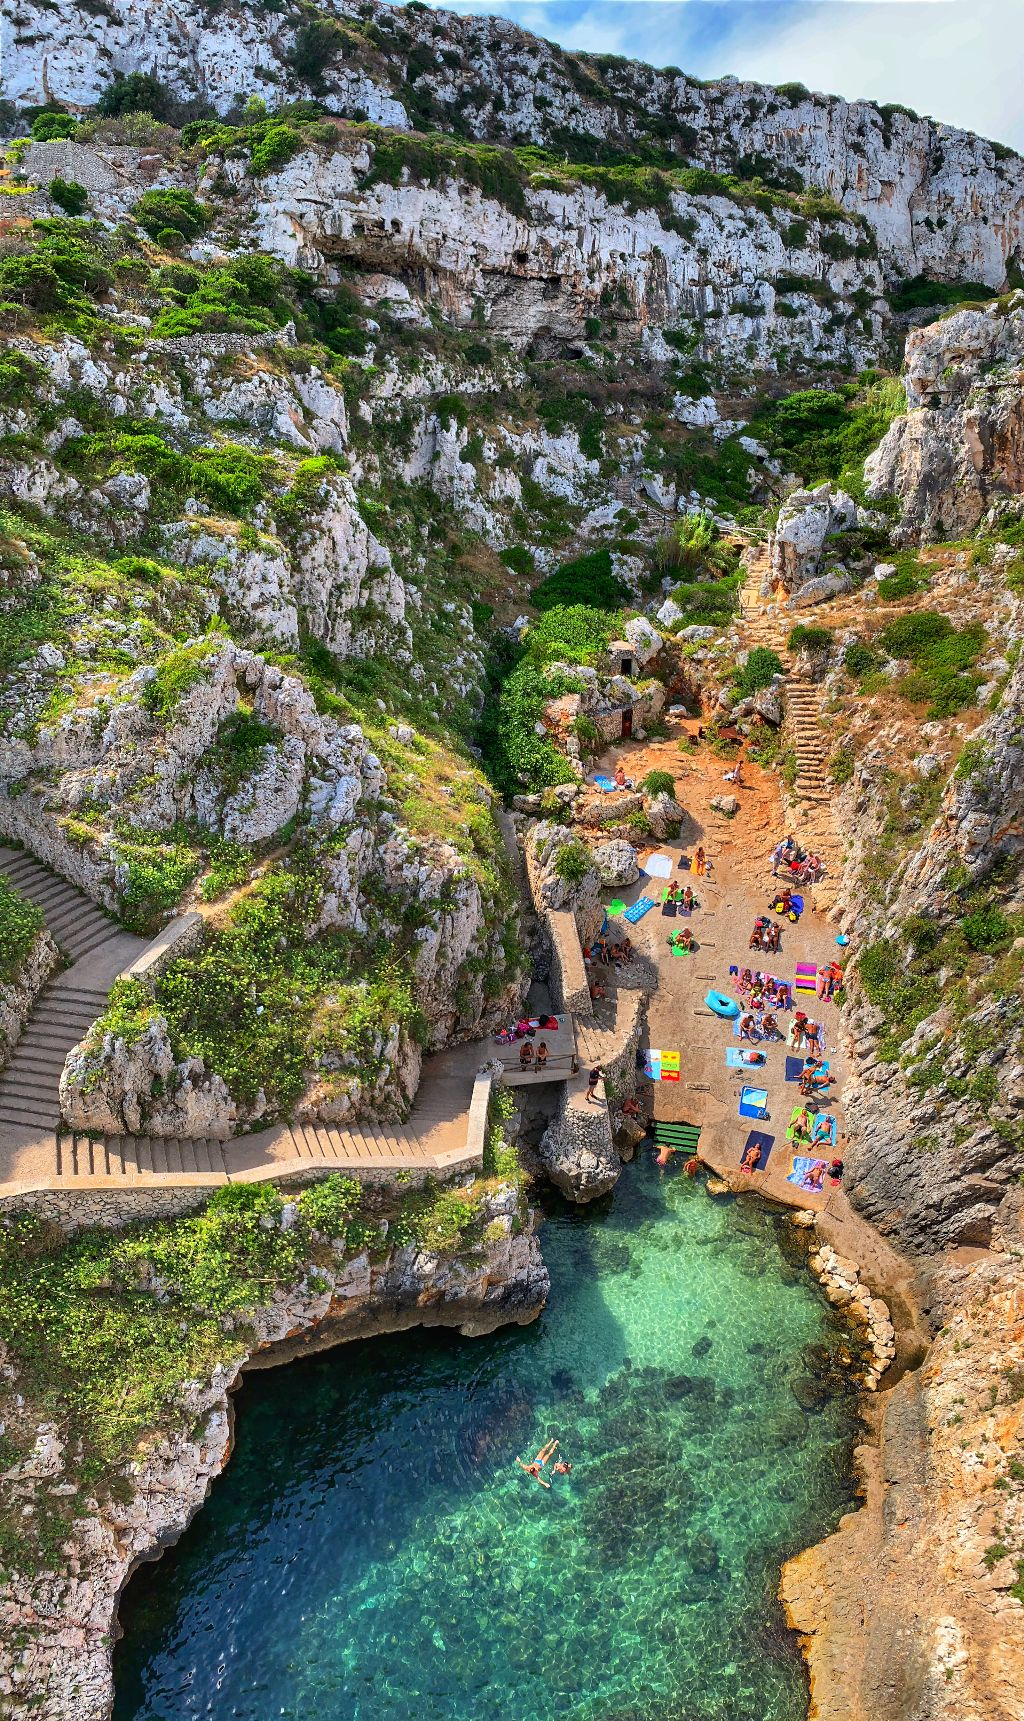 #interesting #summer #holiday #photography #sea #italy #love #paradise